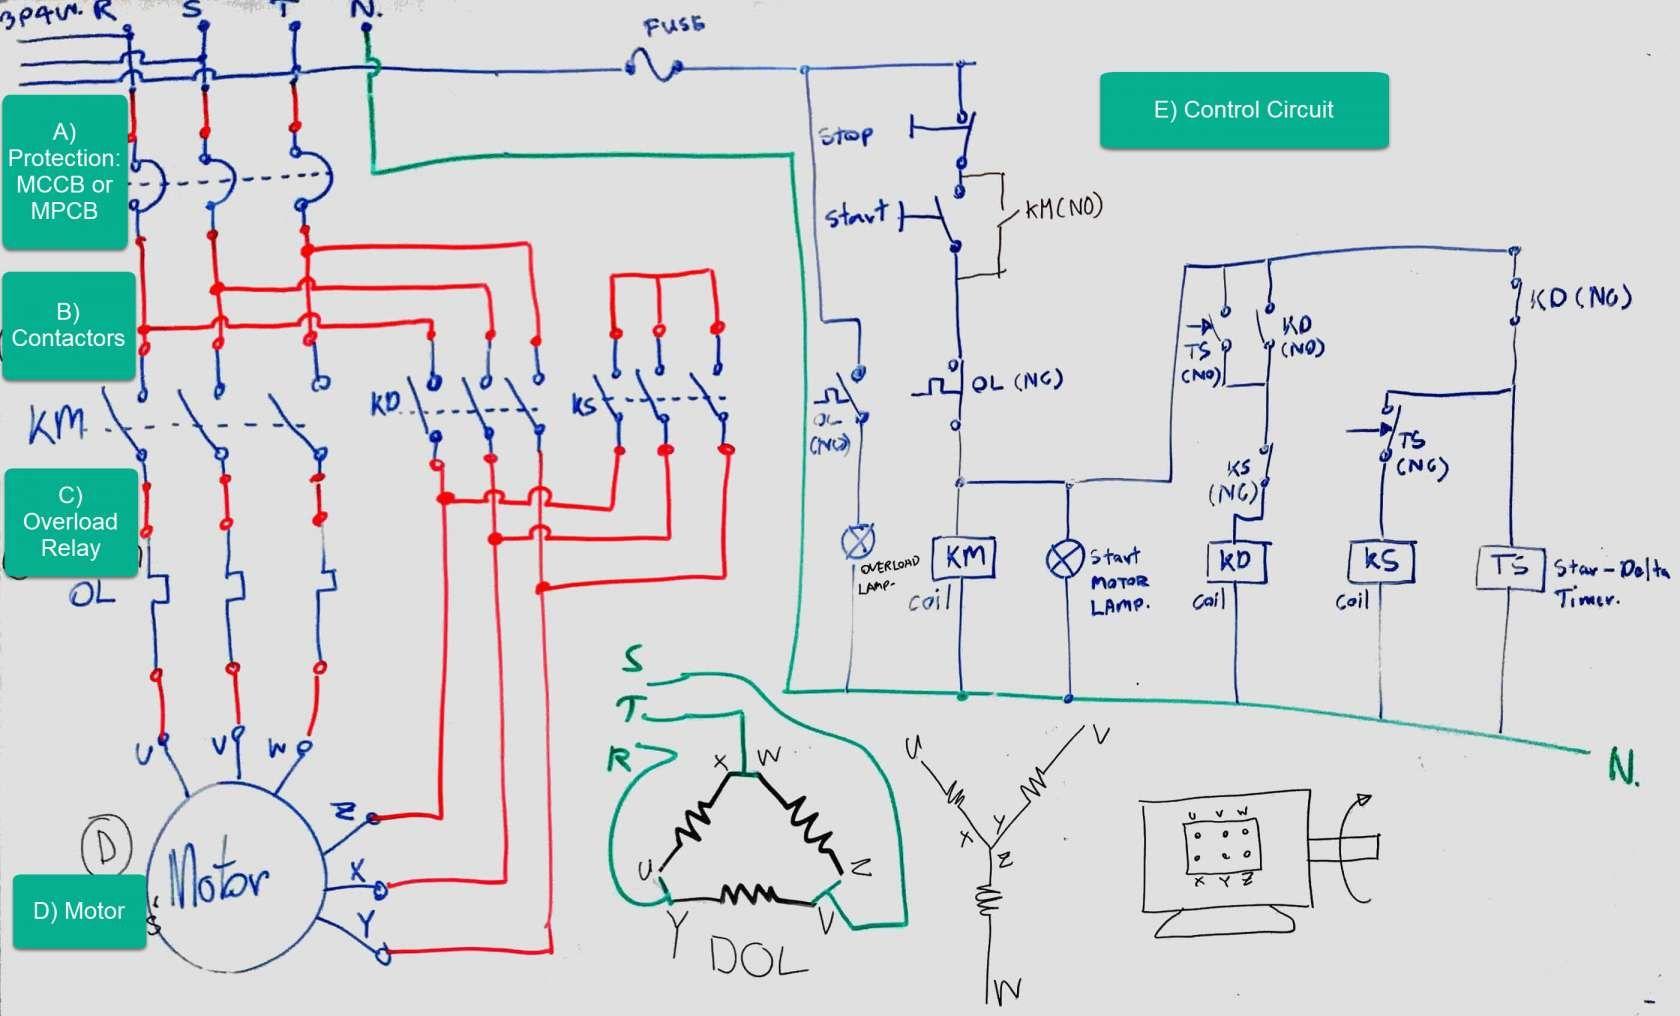 10 Electrical Star Delta Wiring Diagram Wiring Diagram Wiringg Net Diagram Electrical Circuit Diagram Electrical Wiring Diagram